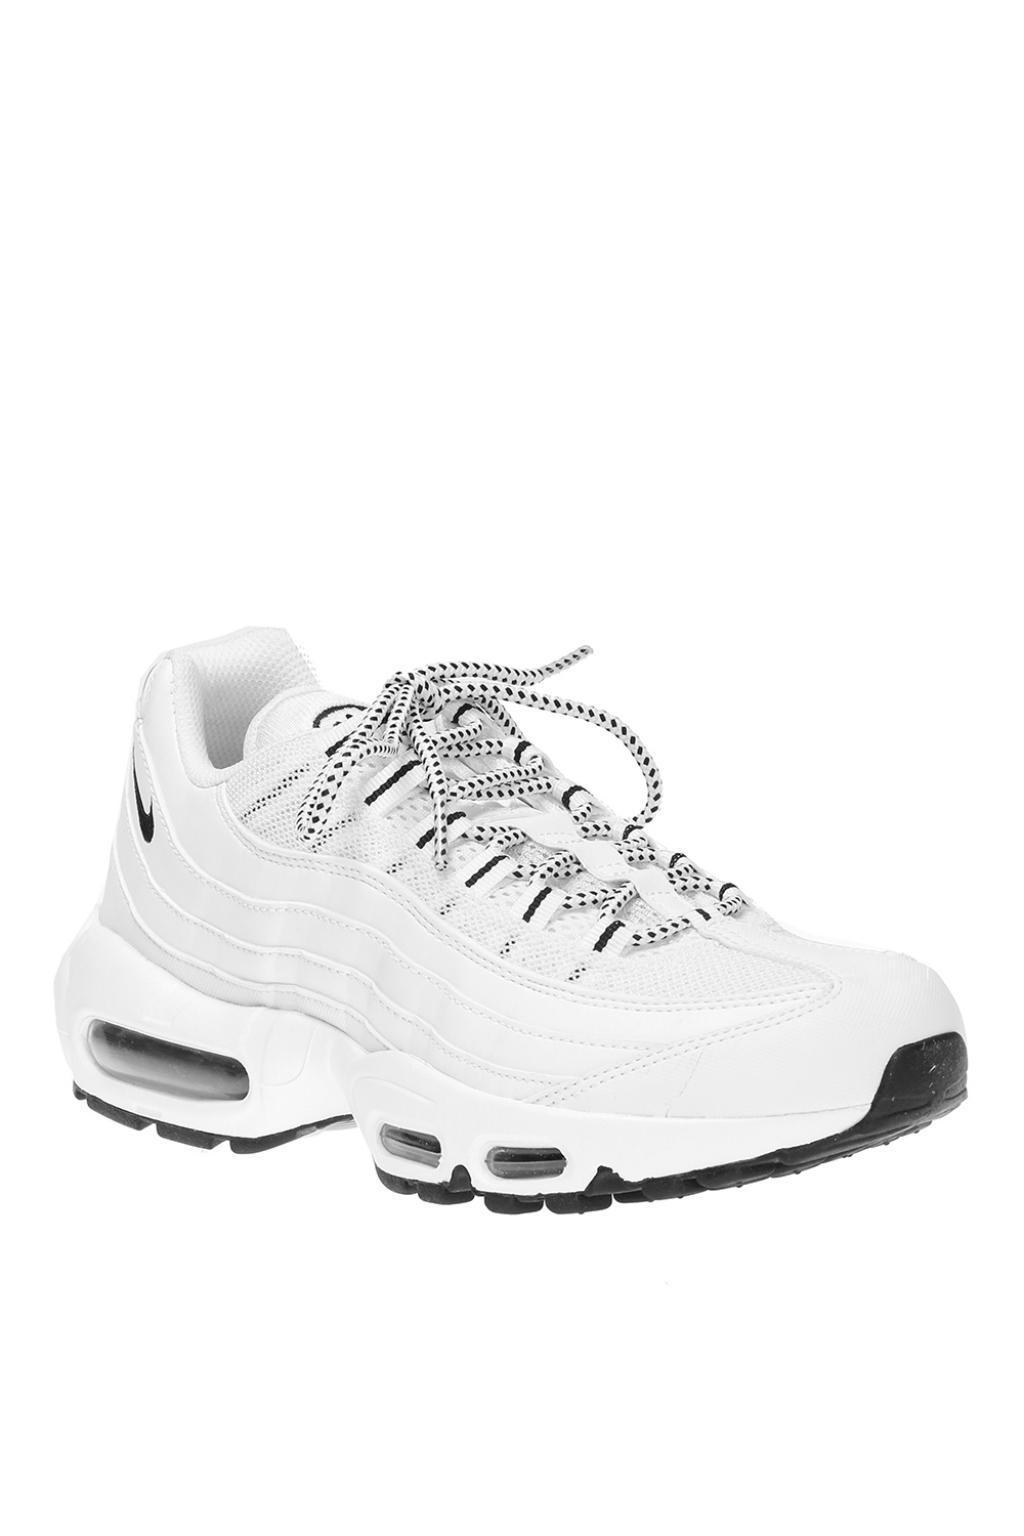 a46bc40fe Nike - White  air Max 95  Sneakers for Men - Lyst. View fullscreen